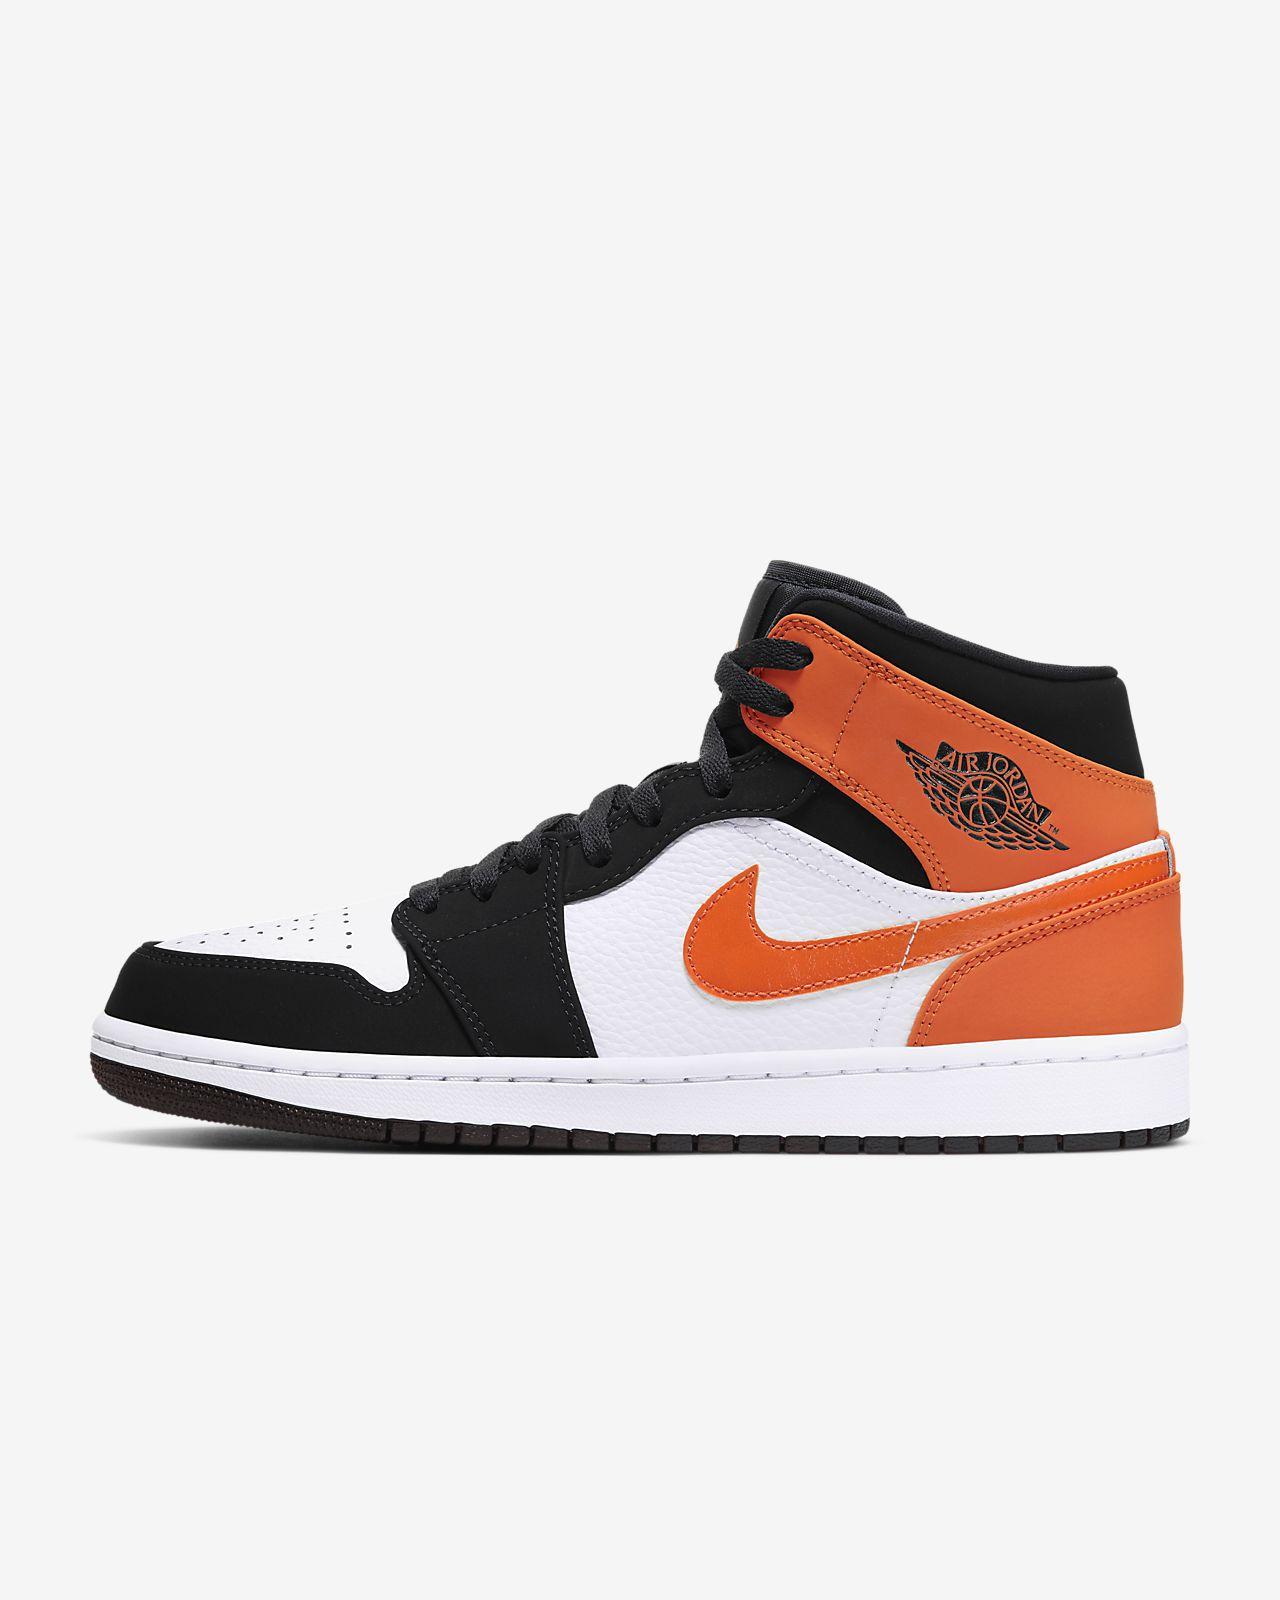 air jordan retr 7 football taglia Uomo 8 1 2 scarpe Nike